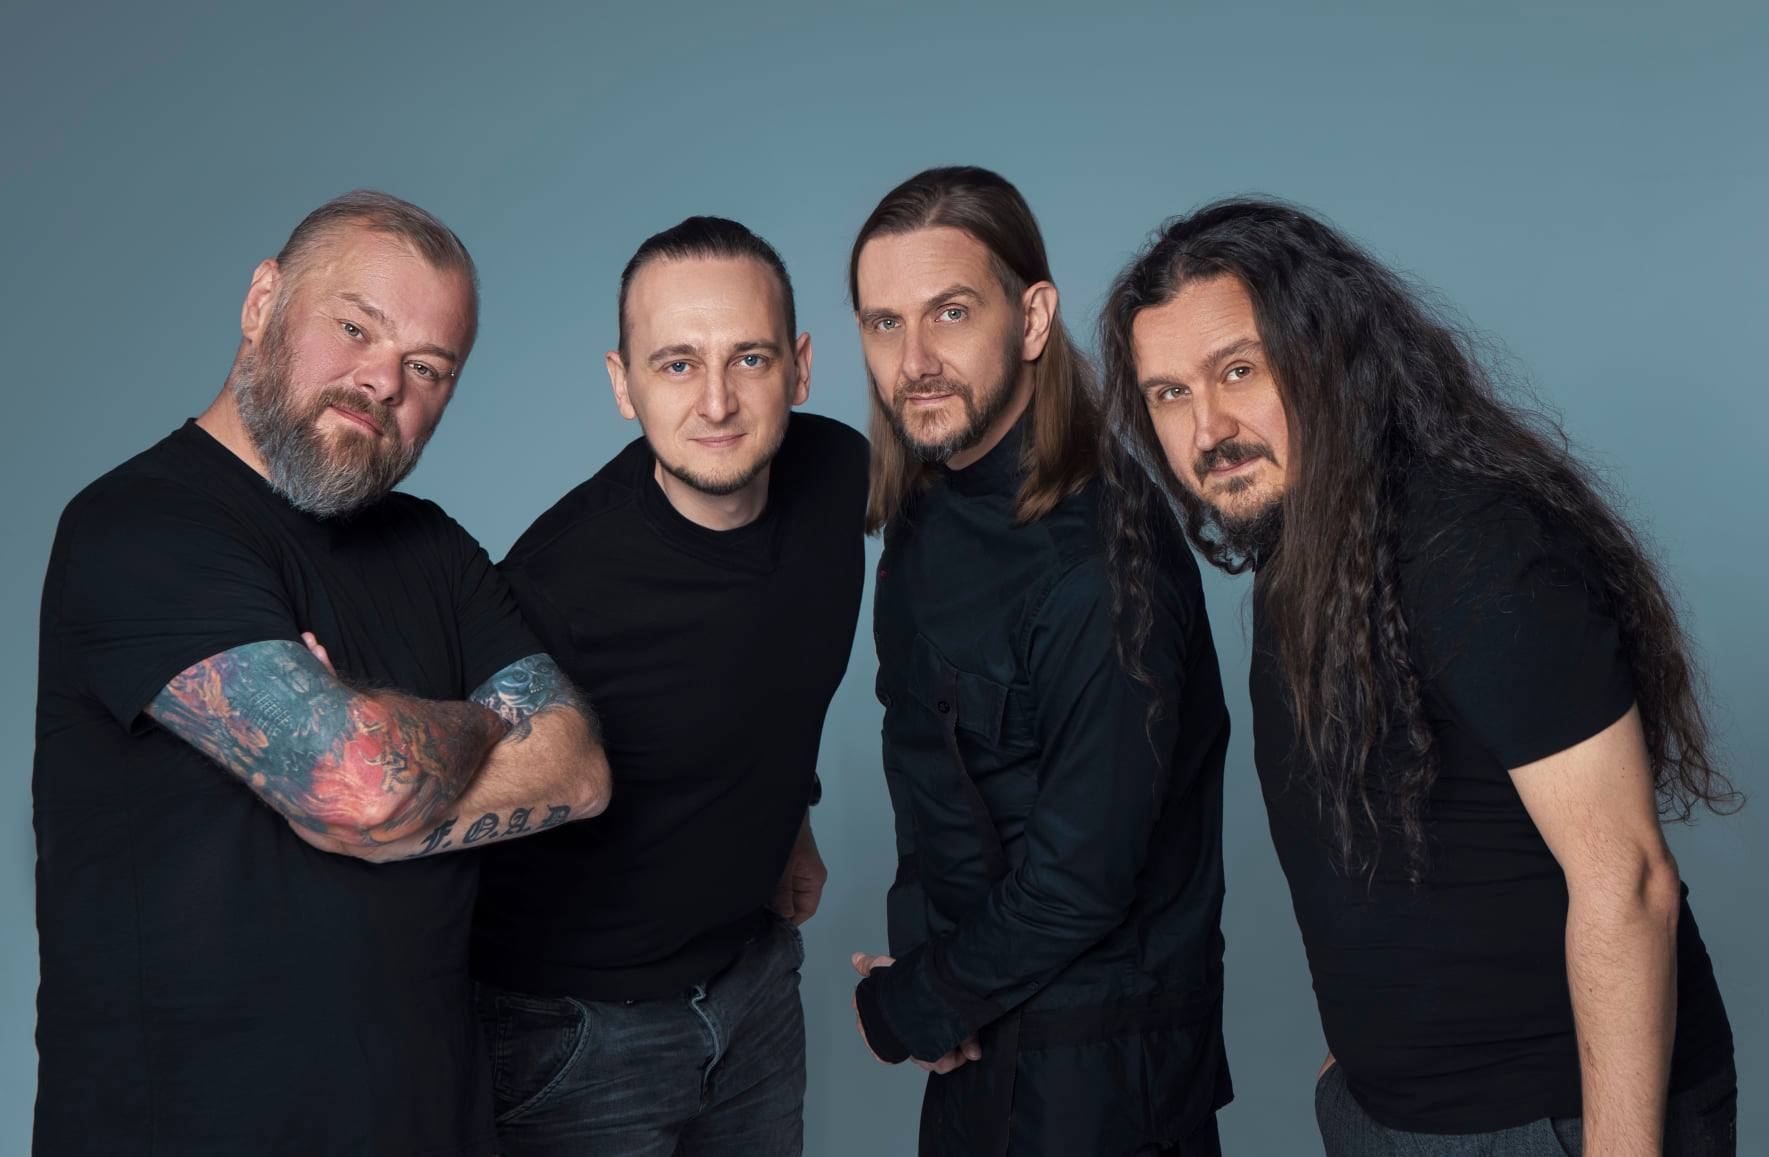 RIVERSIDE GWIAZDĄ INO-ROCK FESTIVAL 2021!